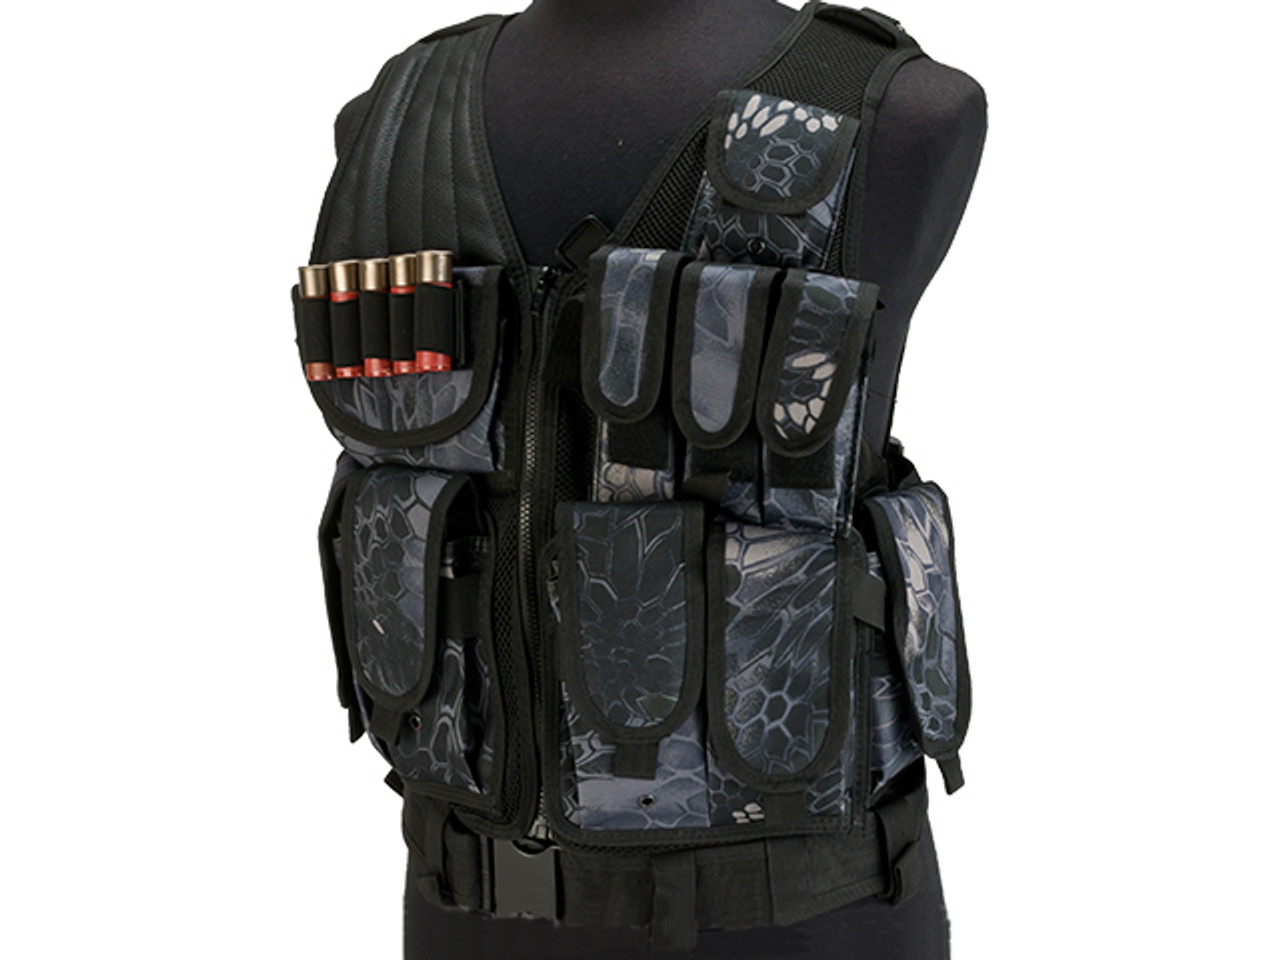 Tactical Cross Draw Shoulder Pistol Gun Holster Black